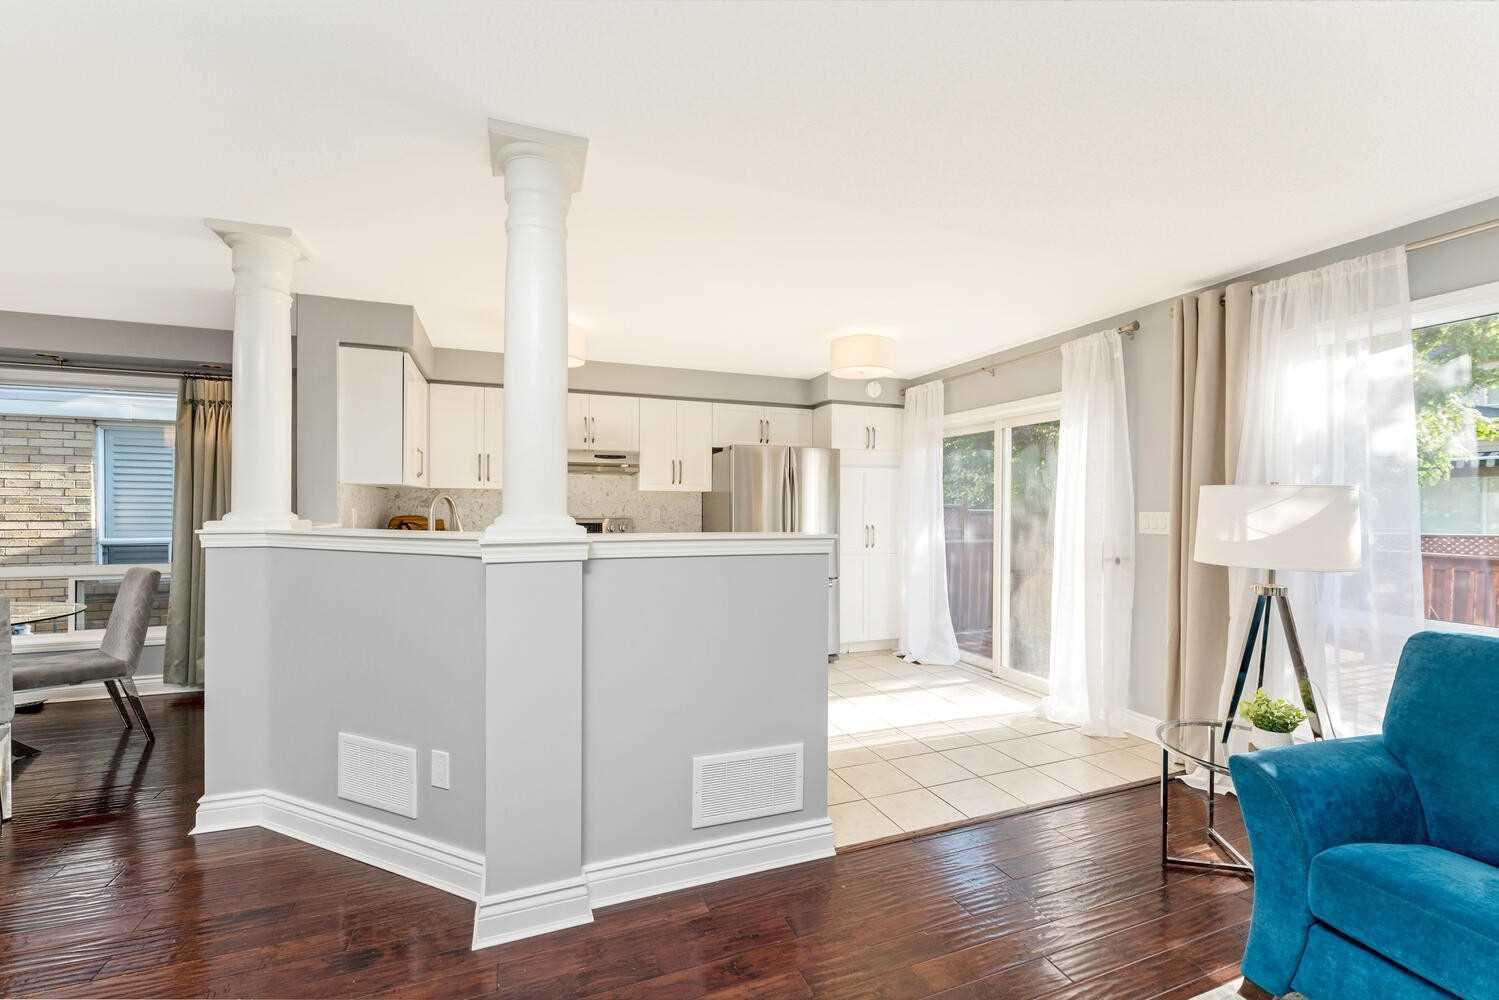 1030 Barclay Circ - Beaty Att/Row/Twnhouse for sale, 3 Bedrooms (W5400435) - #8